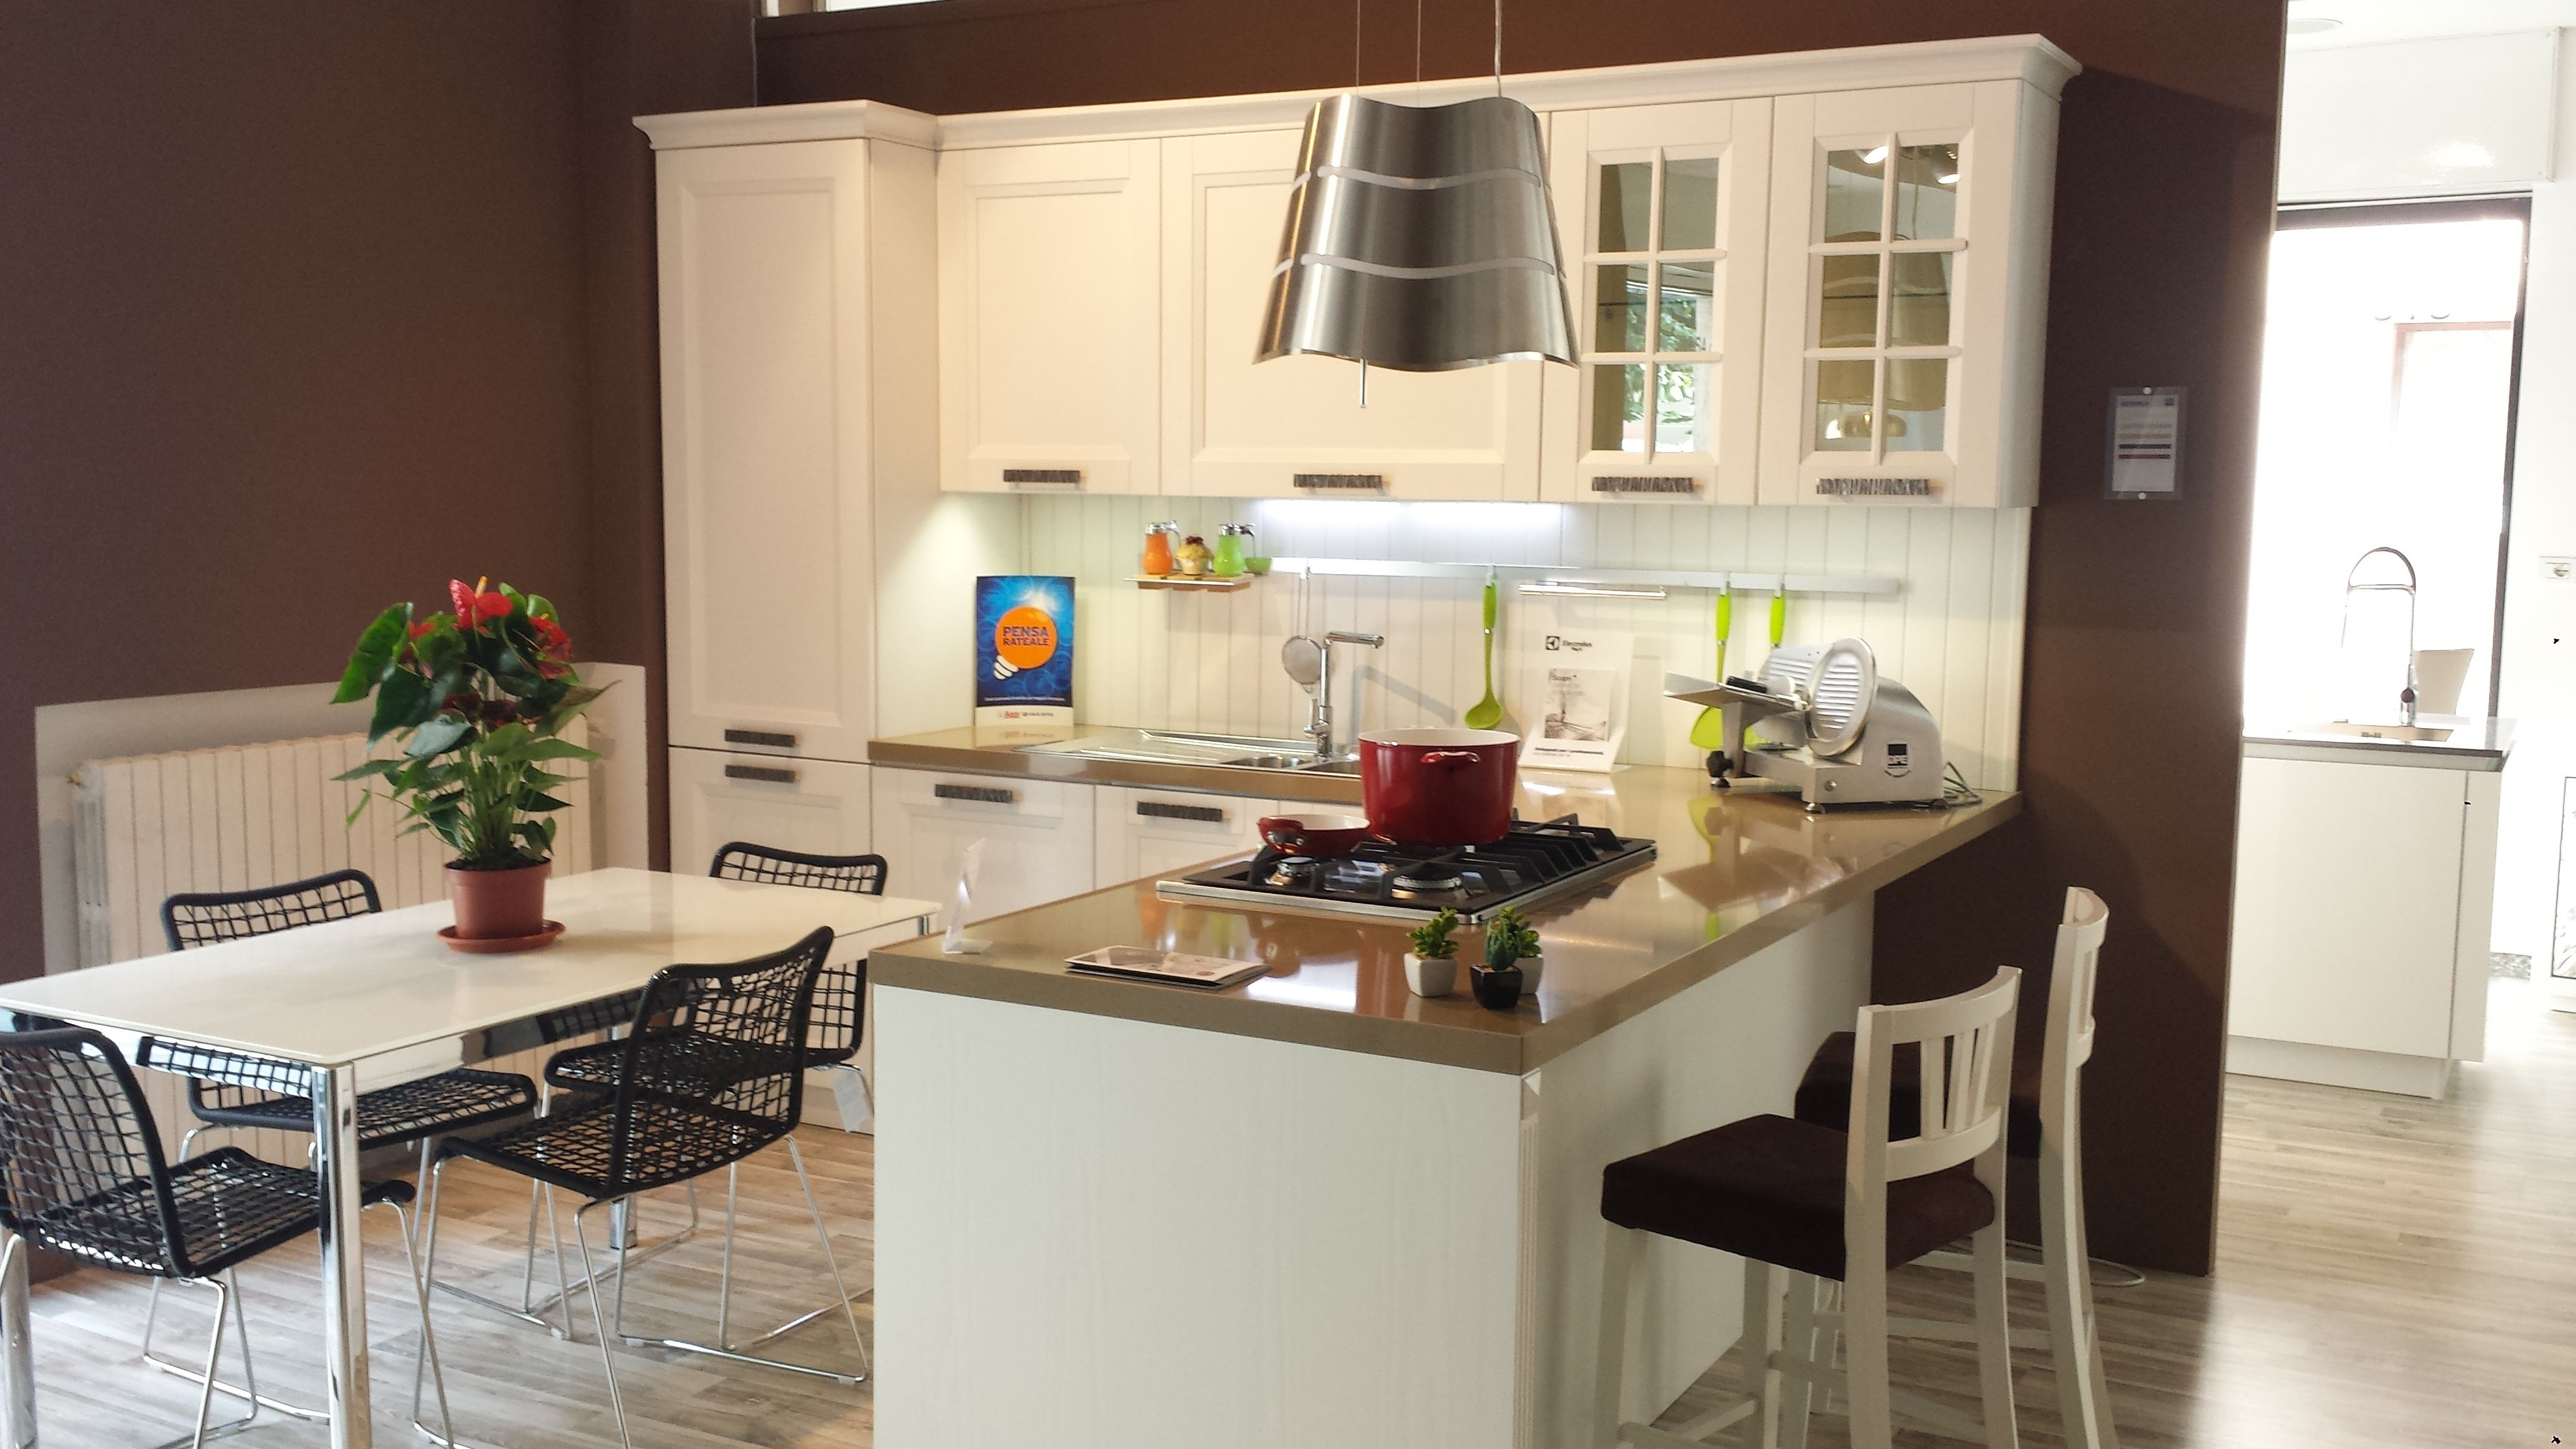 Stosa cucine cucina beverly classica legno bianca cucine for Cucine stile contemporaneo